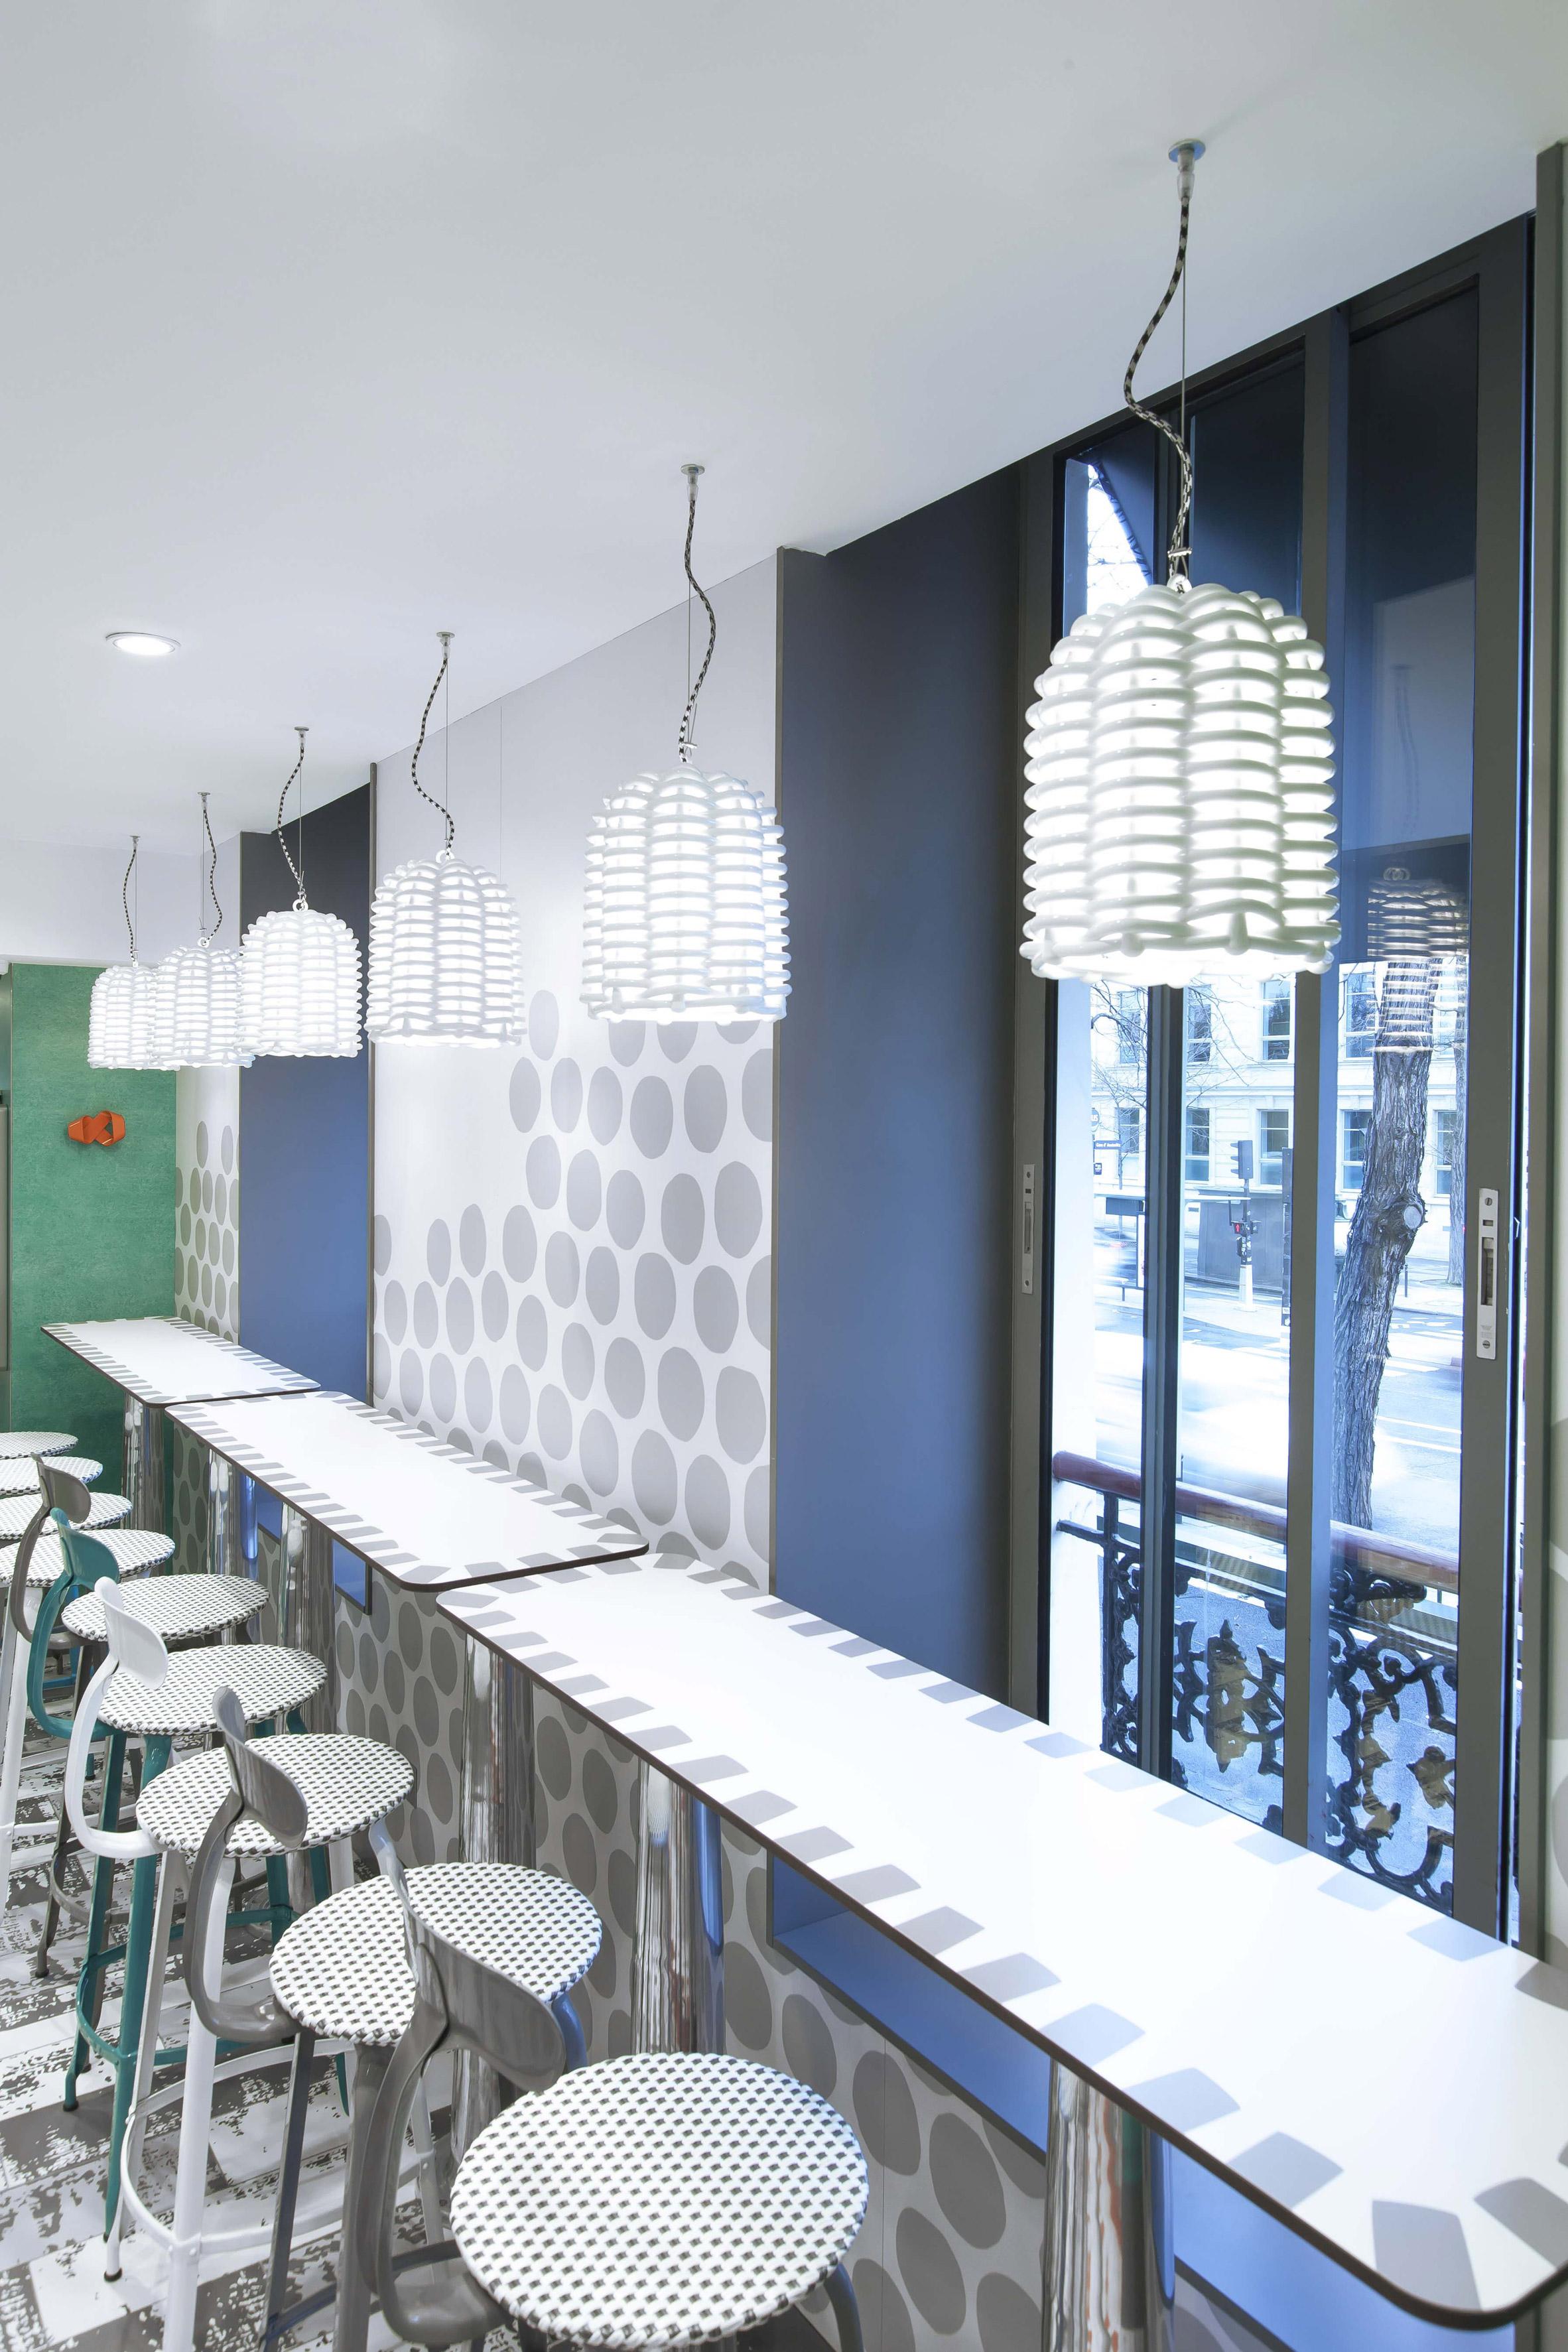 Interiors of McDonald's Austerlitz designed by Paola Navone